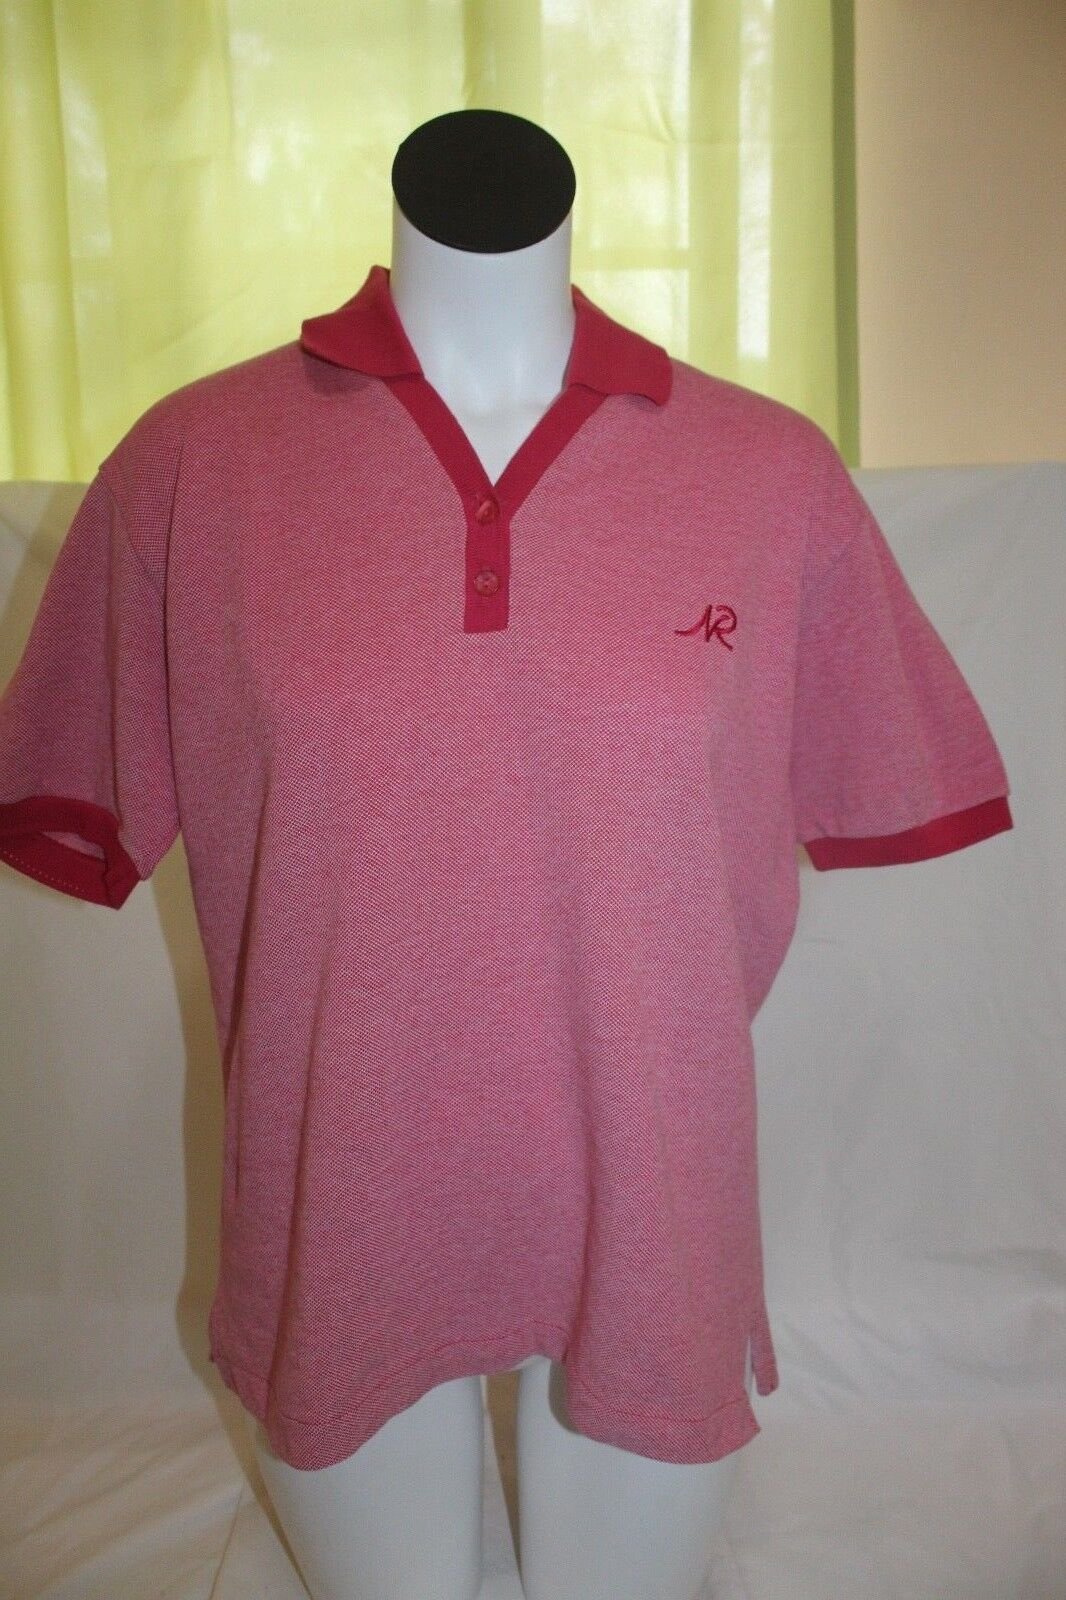 NWT Nina Ricci Knitwear Paris Women's Red Pink Polo Shirt Size Large